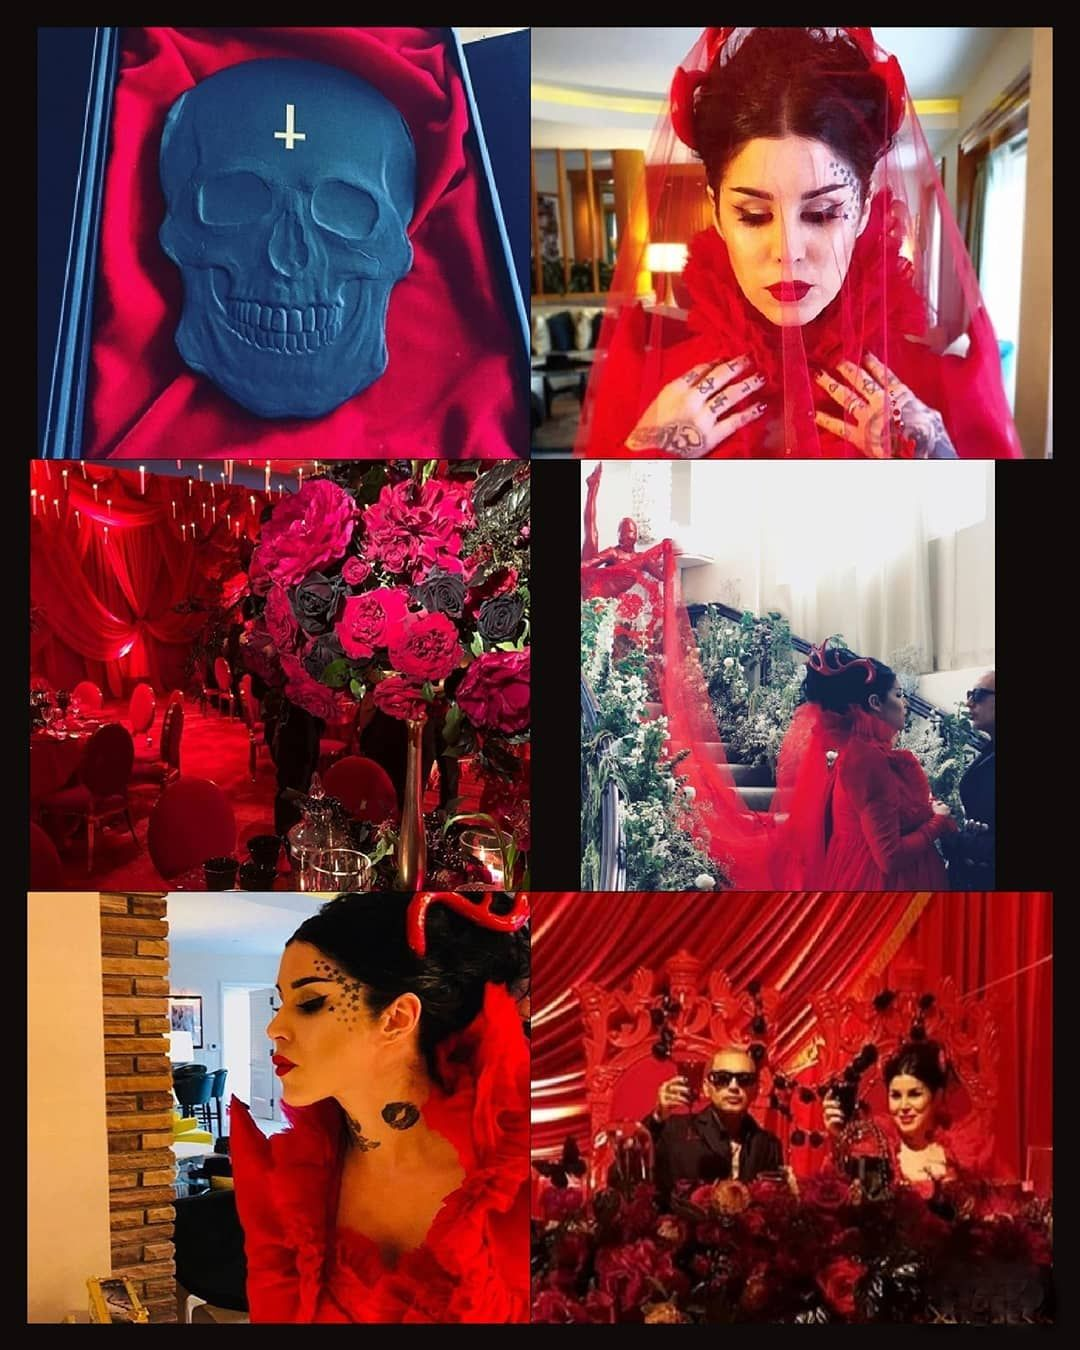 images?q=tbn:ANd9GcQh_l3eQ5xwiPy07kGEXjmjgmBKBRB7H2mRxCGhv1tFWg5c_mWT Best Of Kat Von D Red Wedding Dress @bookmarkpages.info